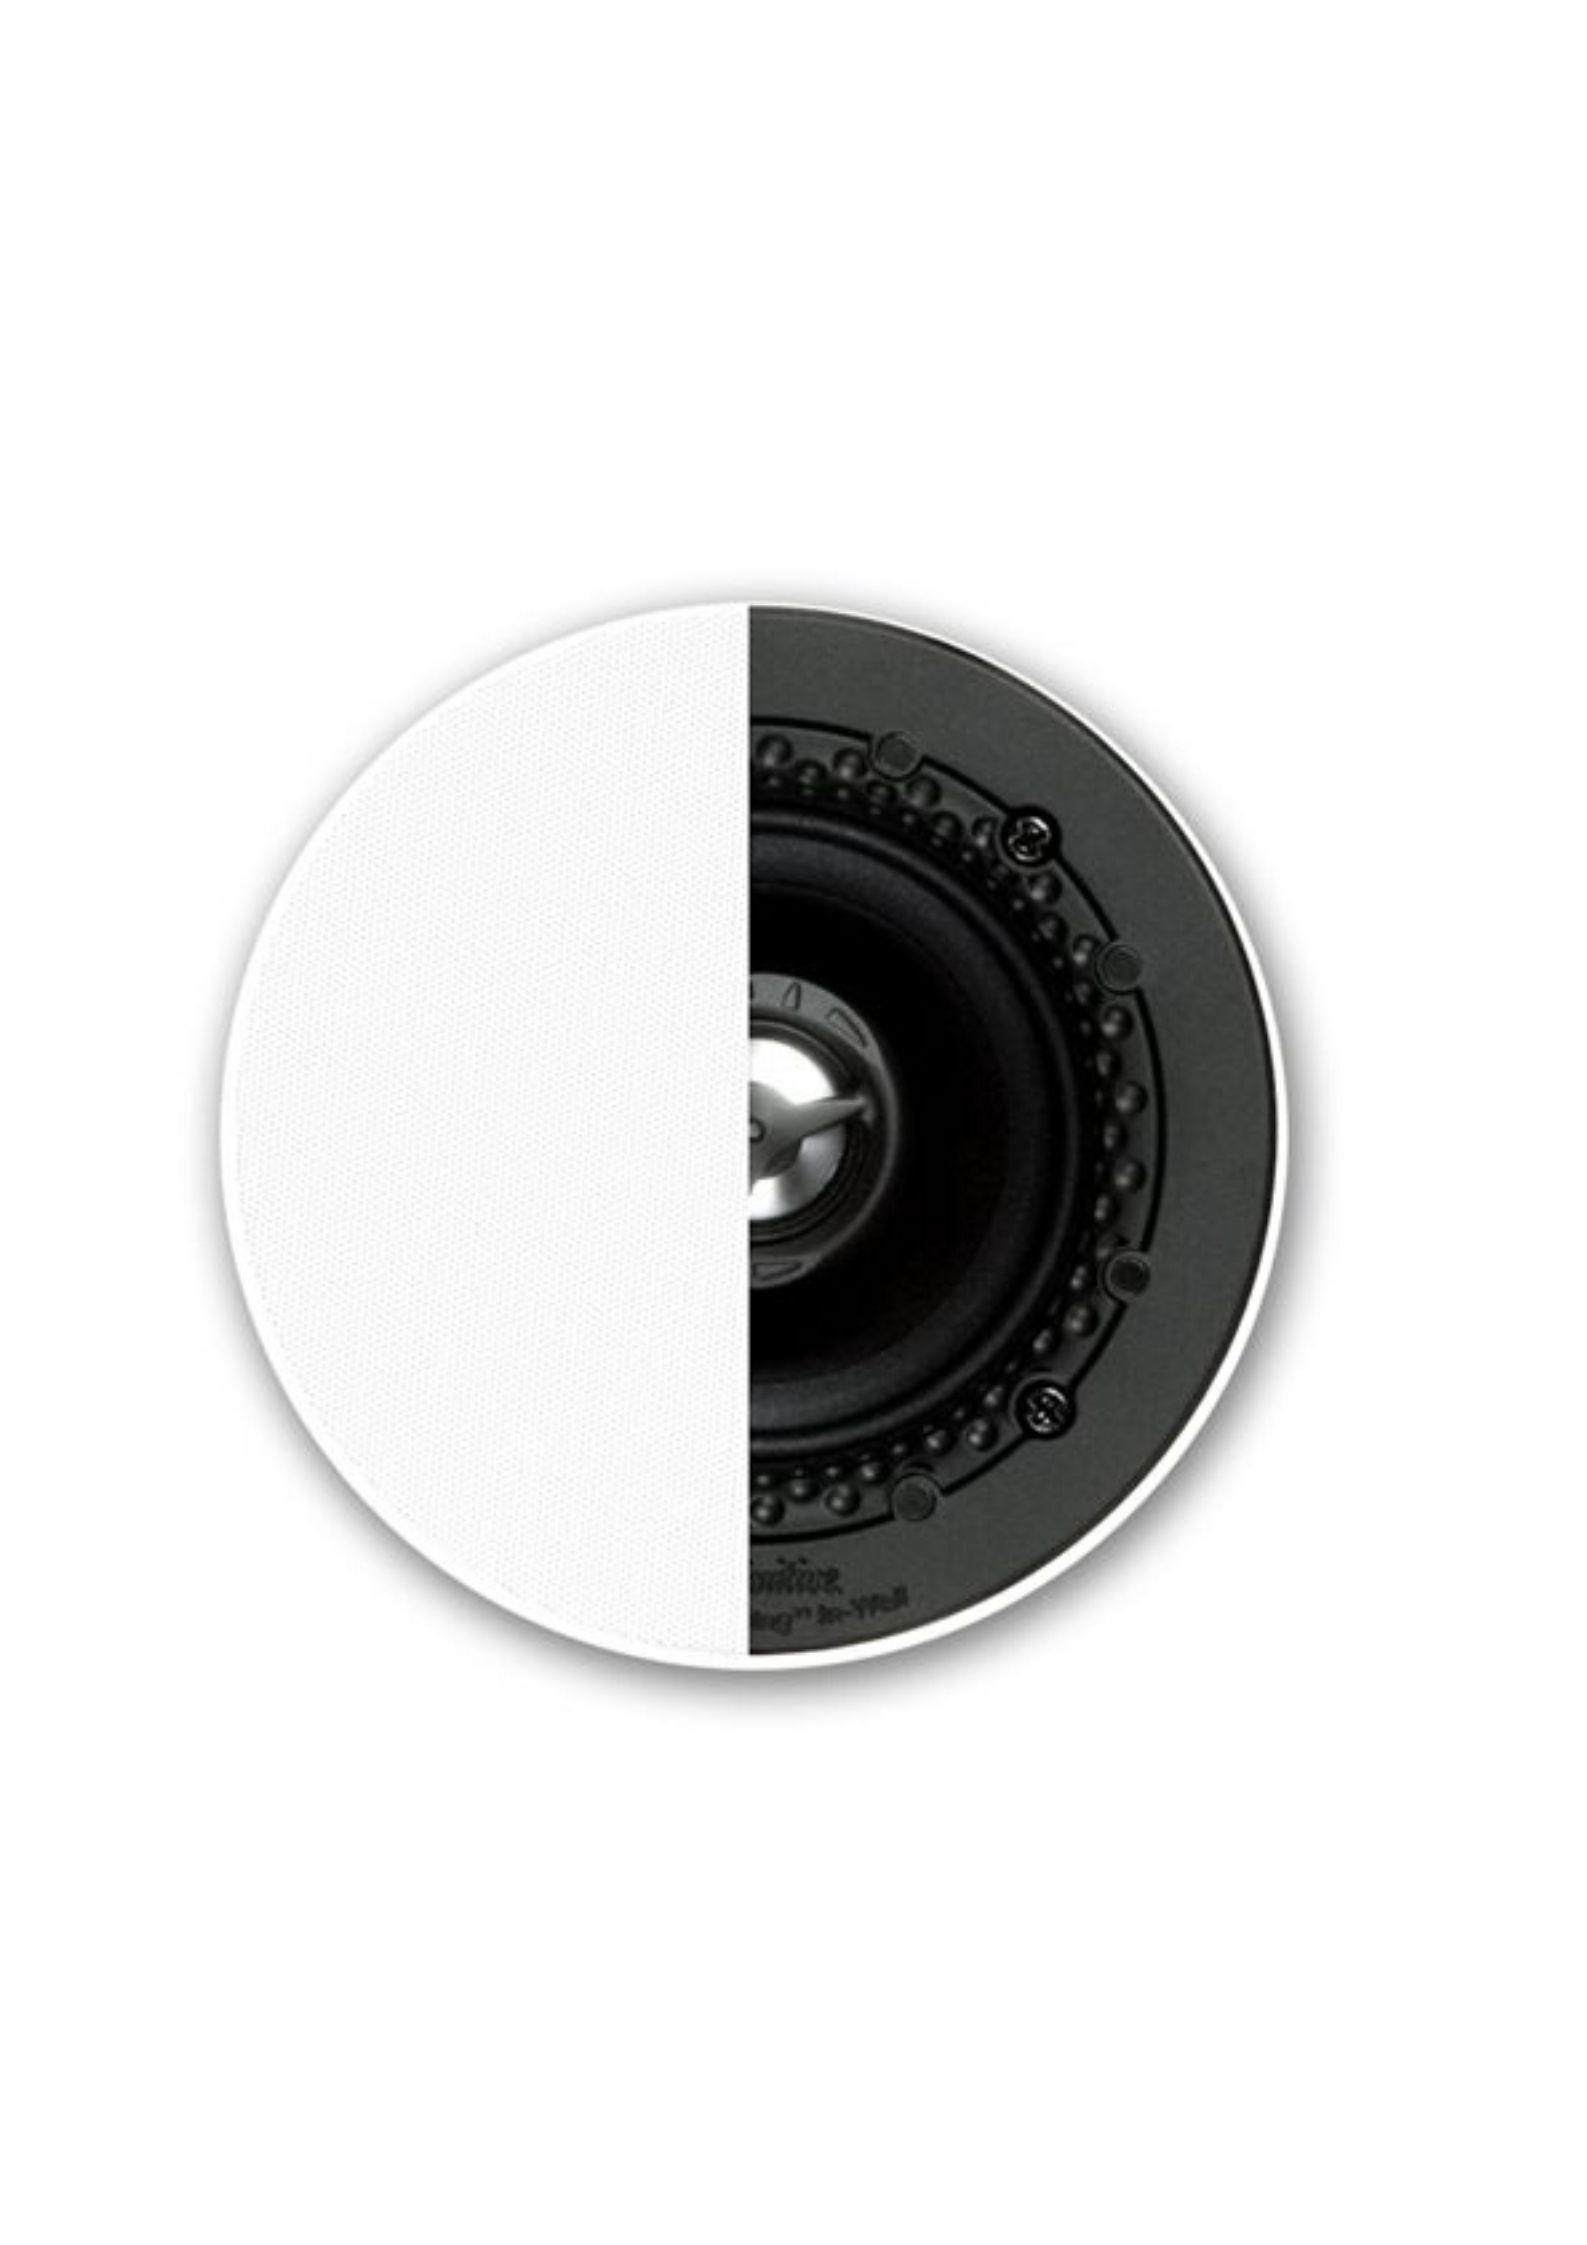 Definitive Technology DI 3.5R Χωνευτό Ηχείο 3.5″ 8Ω 125W